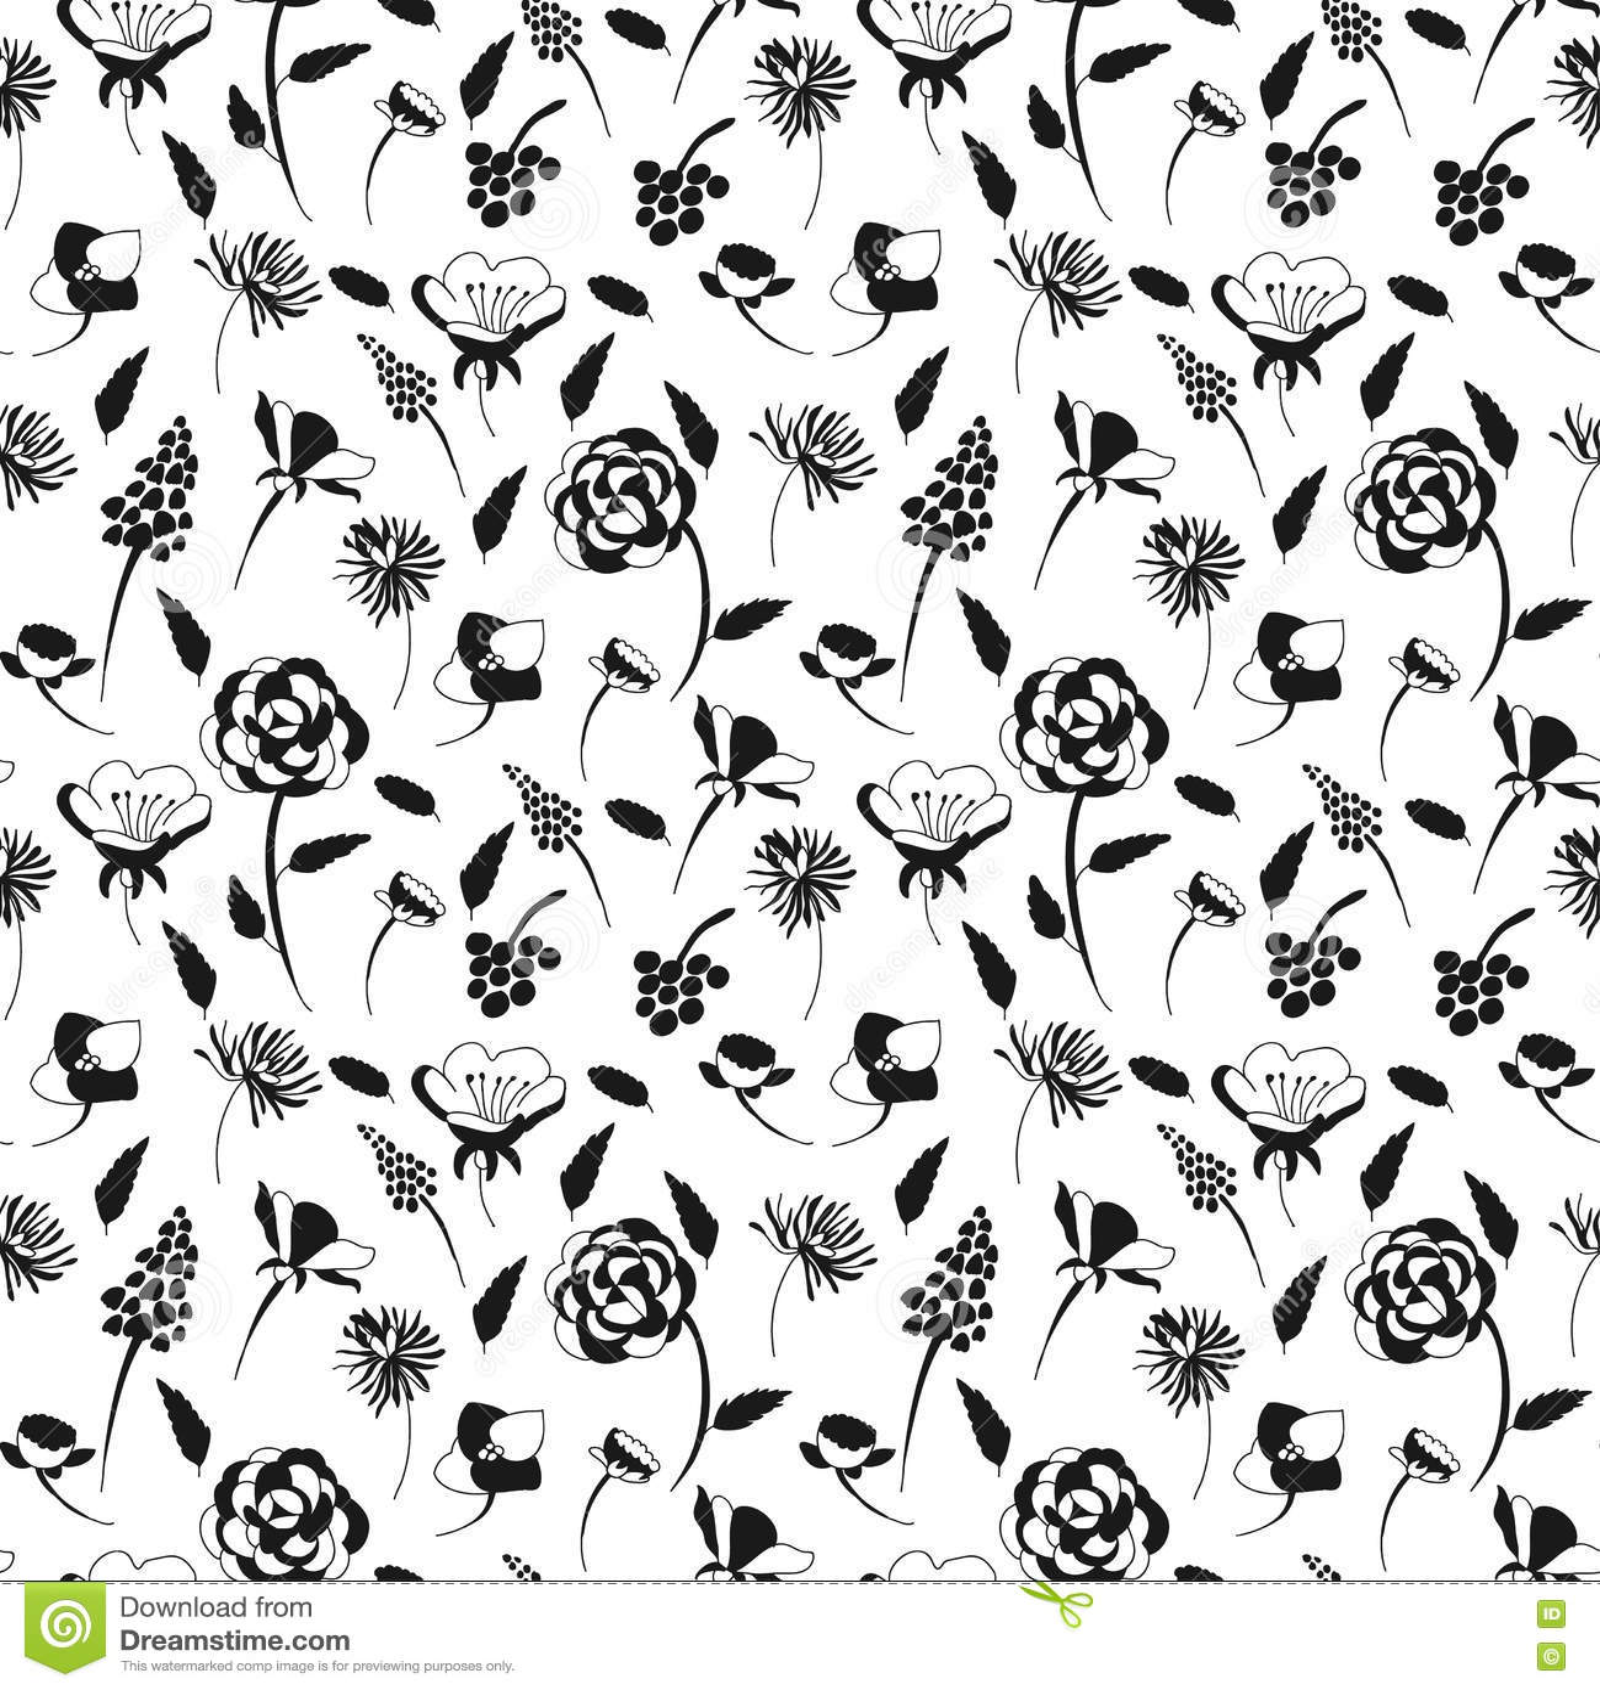 Bnw flower pattern stock vector. Illustration of greeting - 76732110